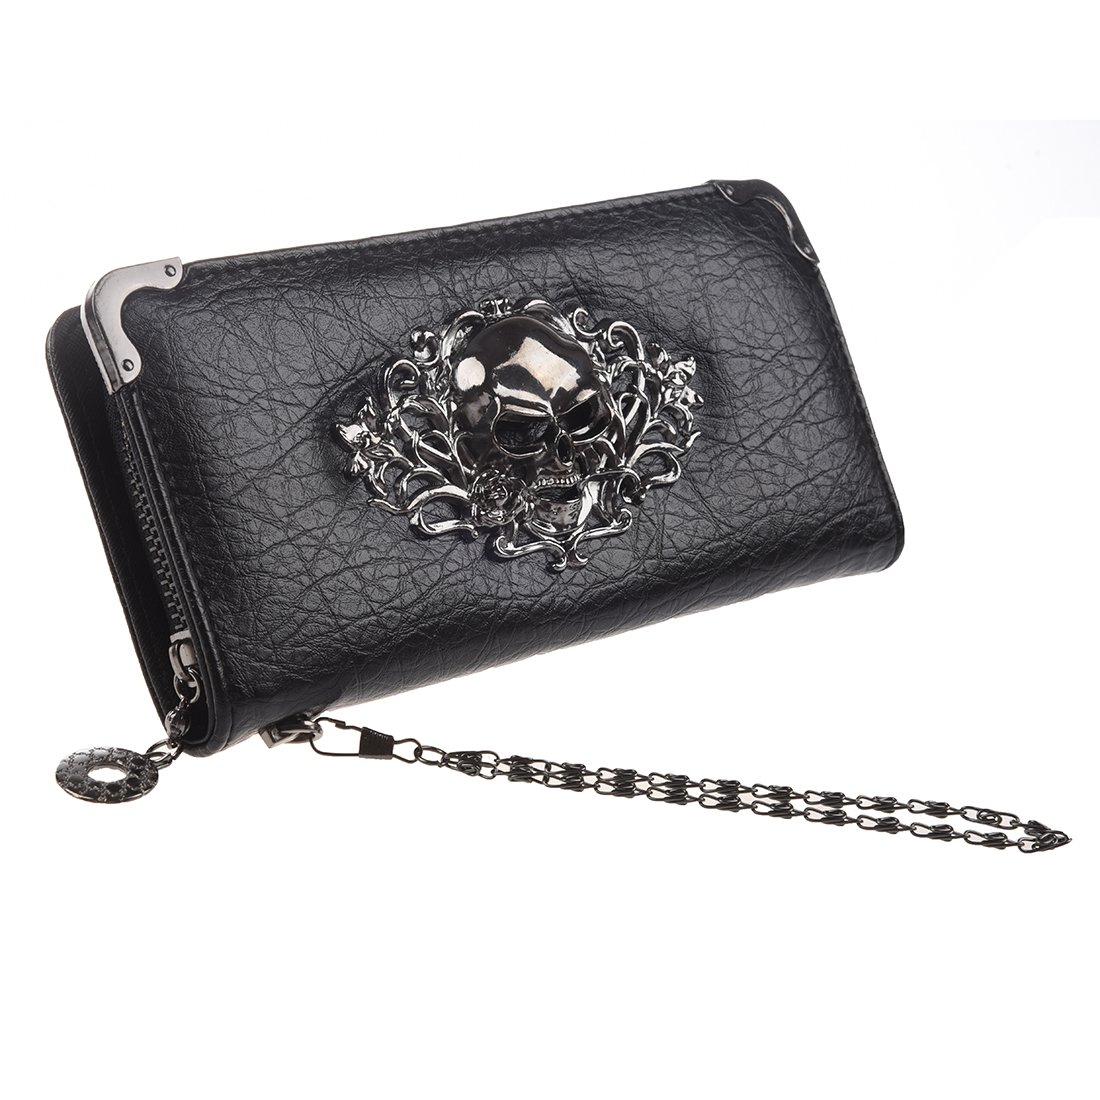 HOYOFO Skull Wallets for Women Long Purse Phone Card Holder Cool Fashion Clutch Wallet, Black